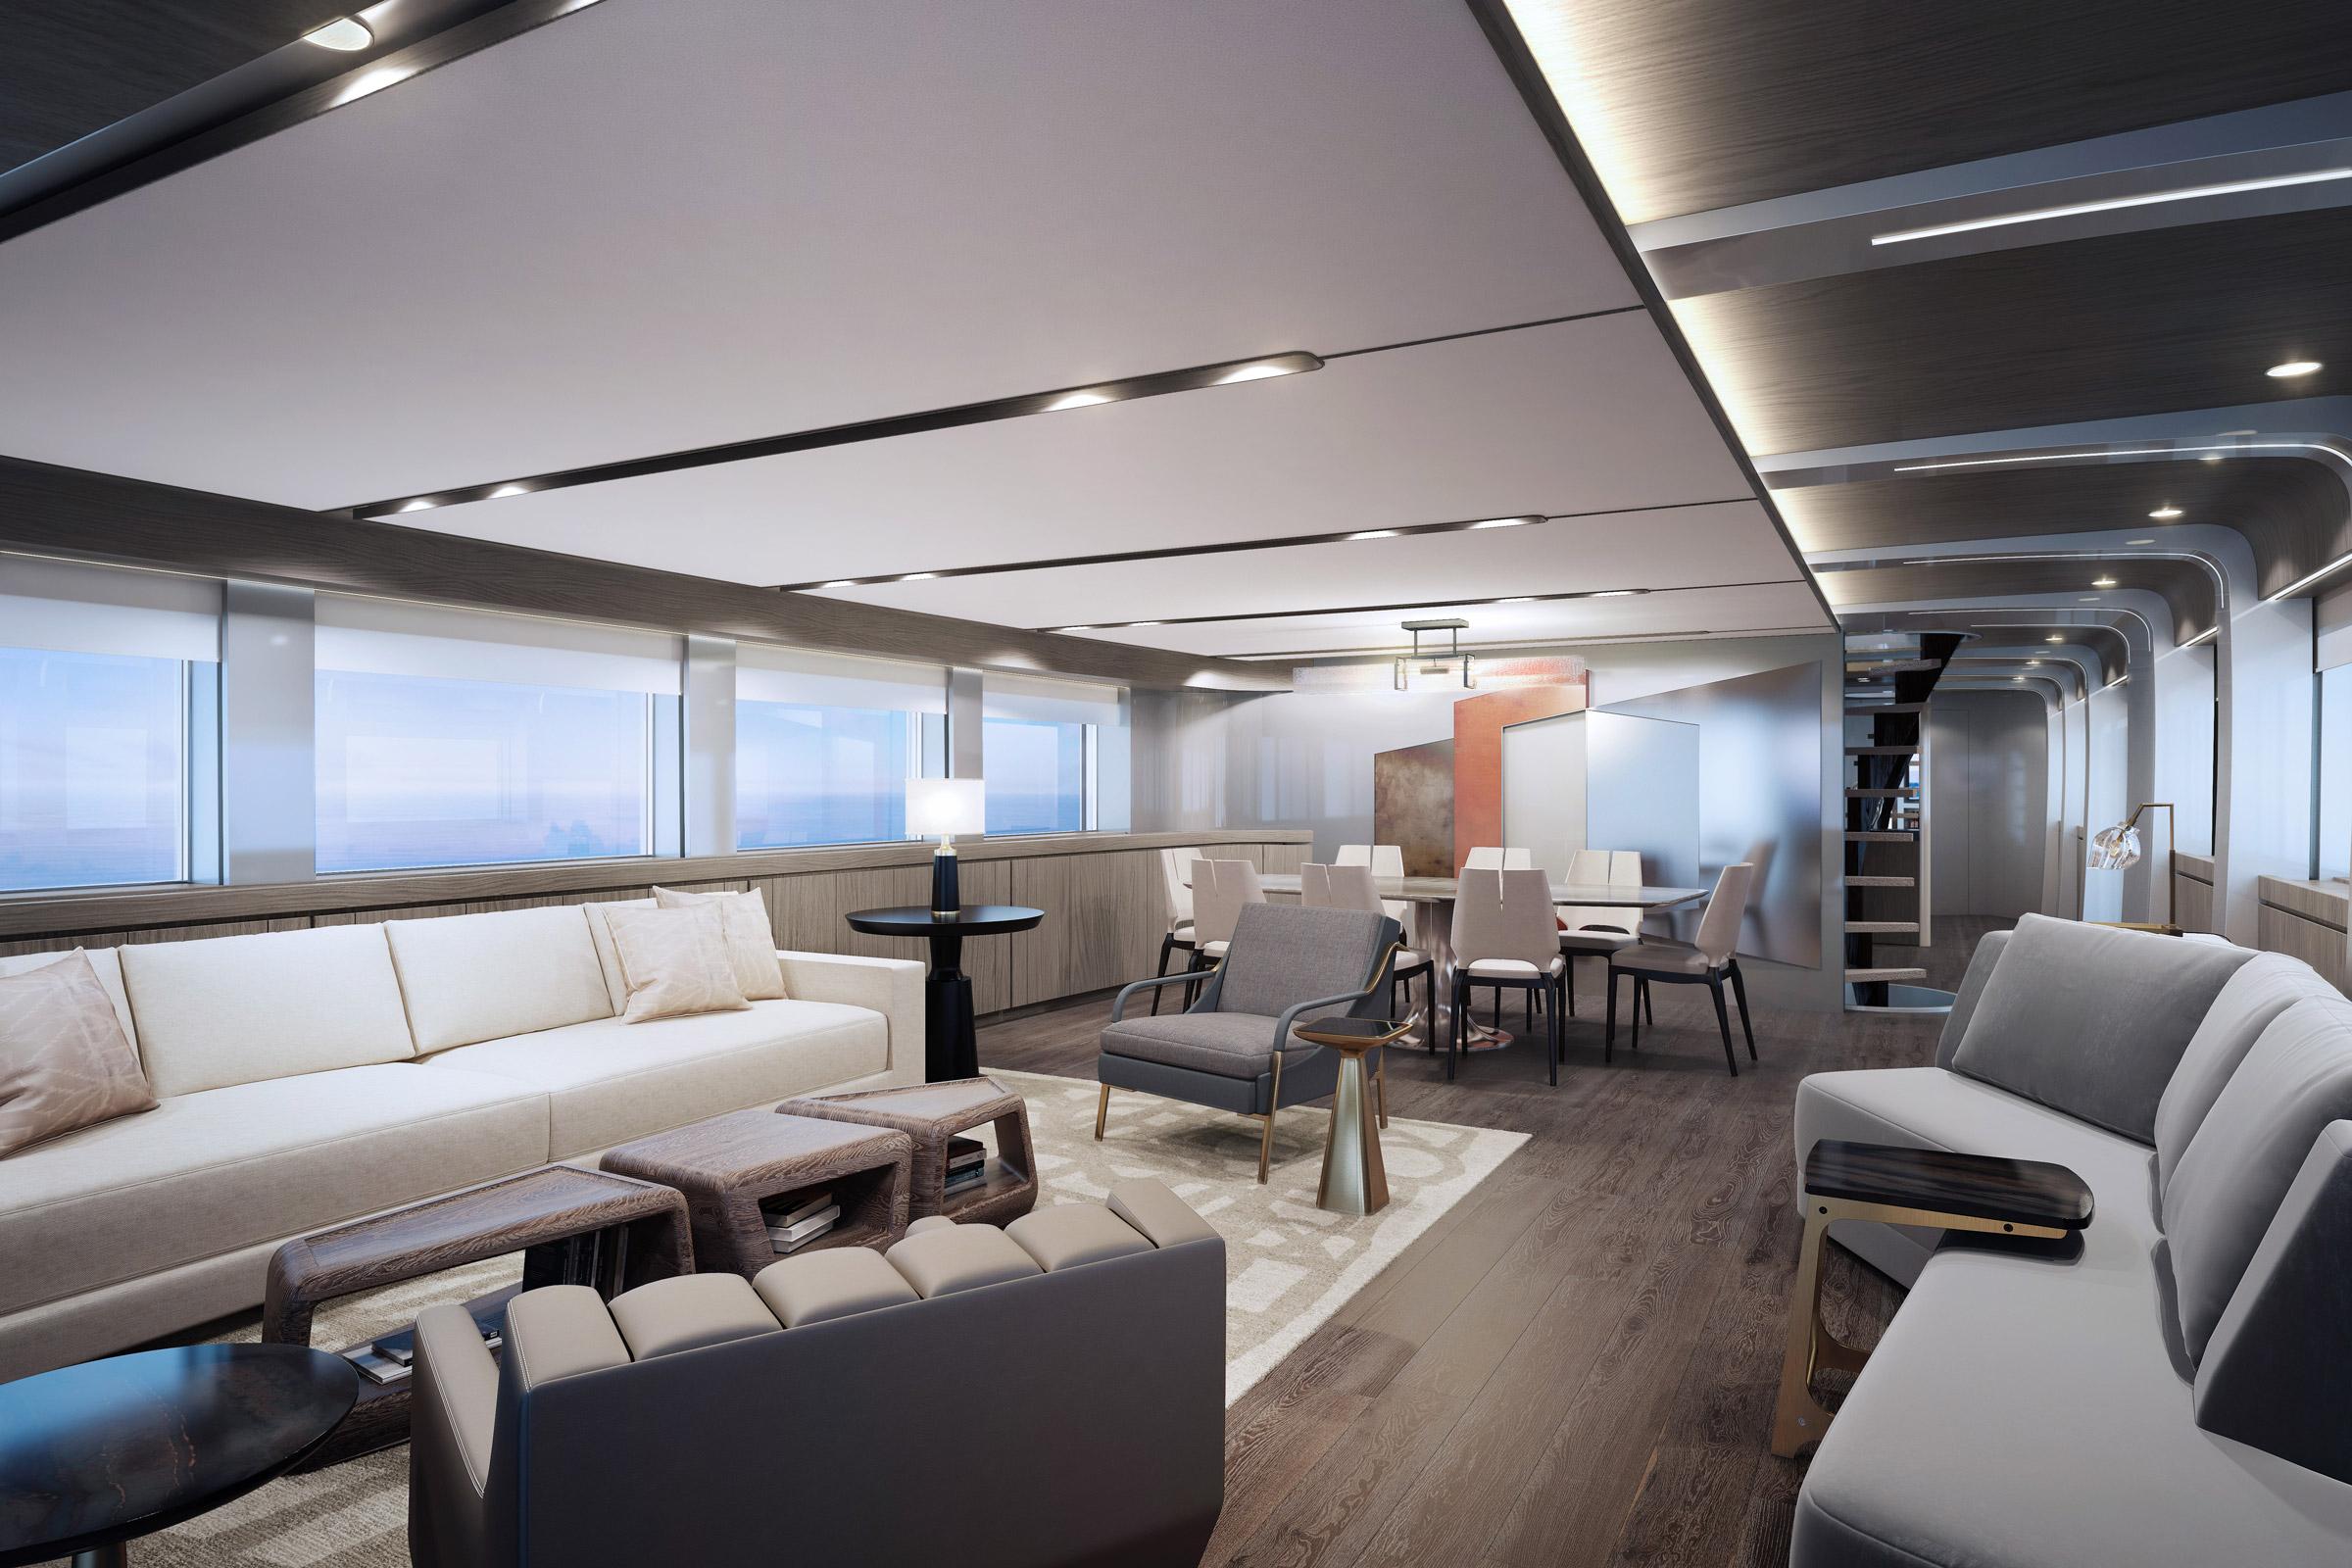 HH_Yacht_Salon_Cam1_Opt3_V2_005